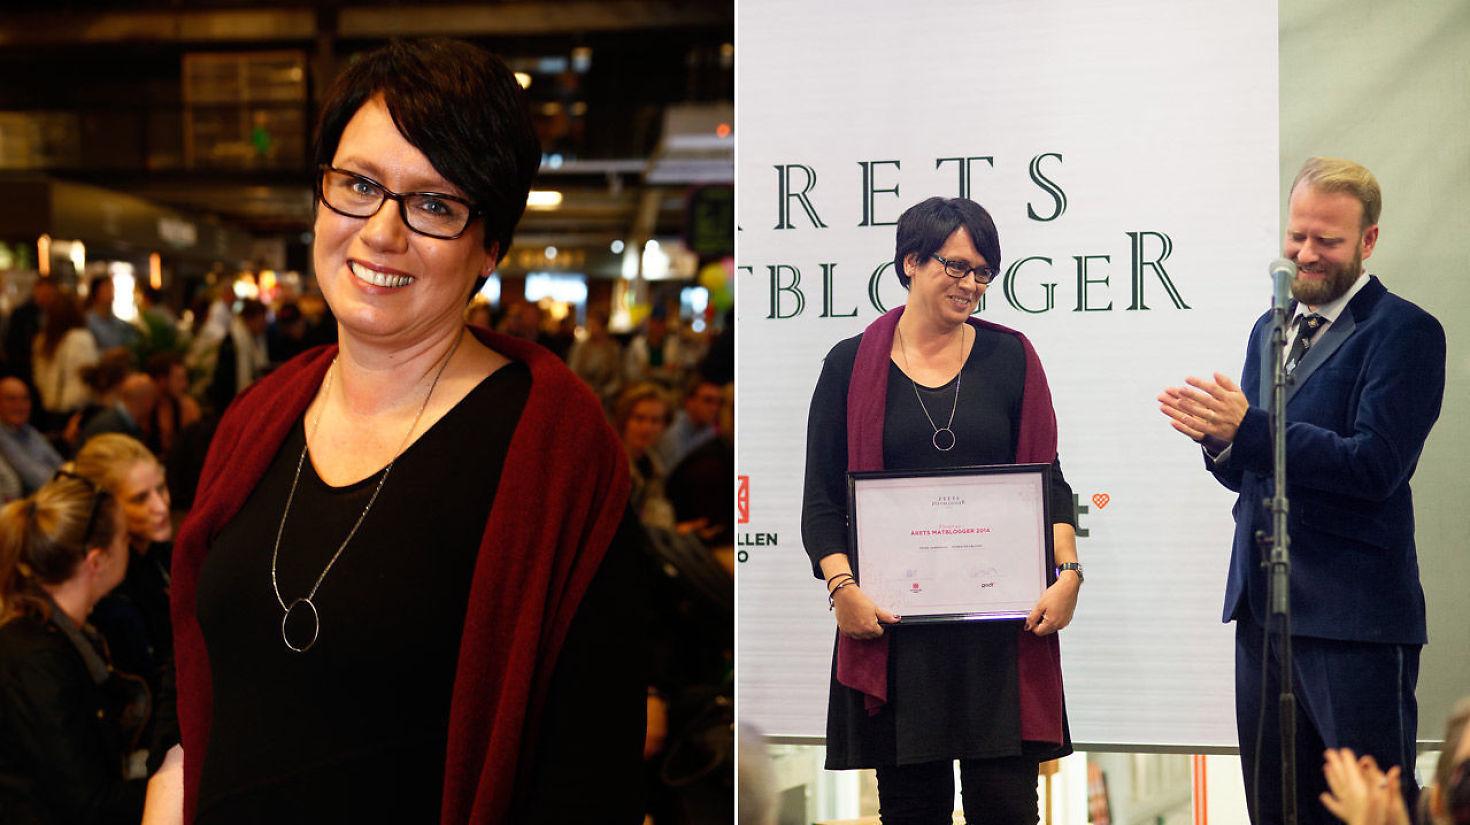 Trines matblogg ble Årets Matblogg 2014